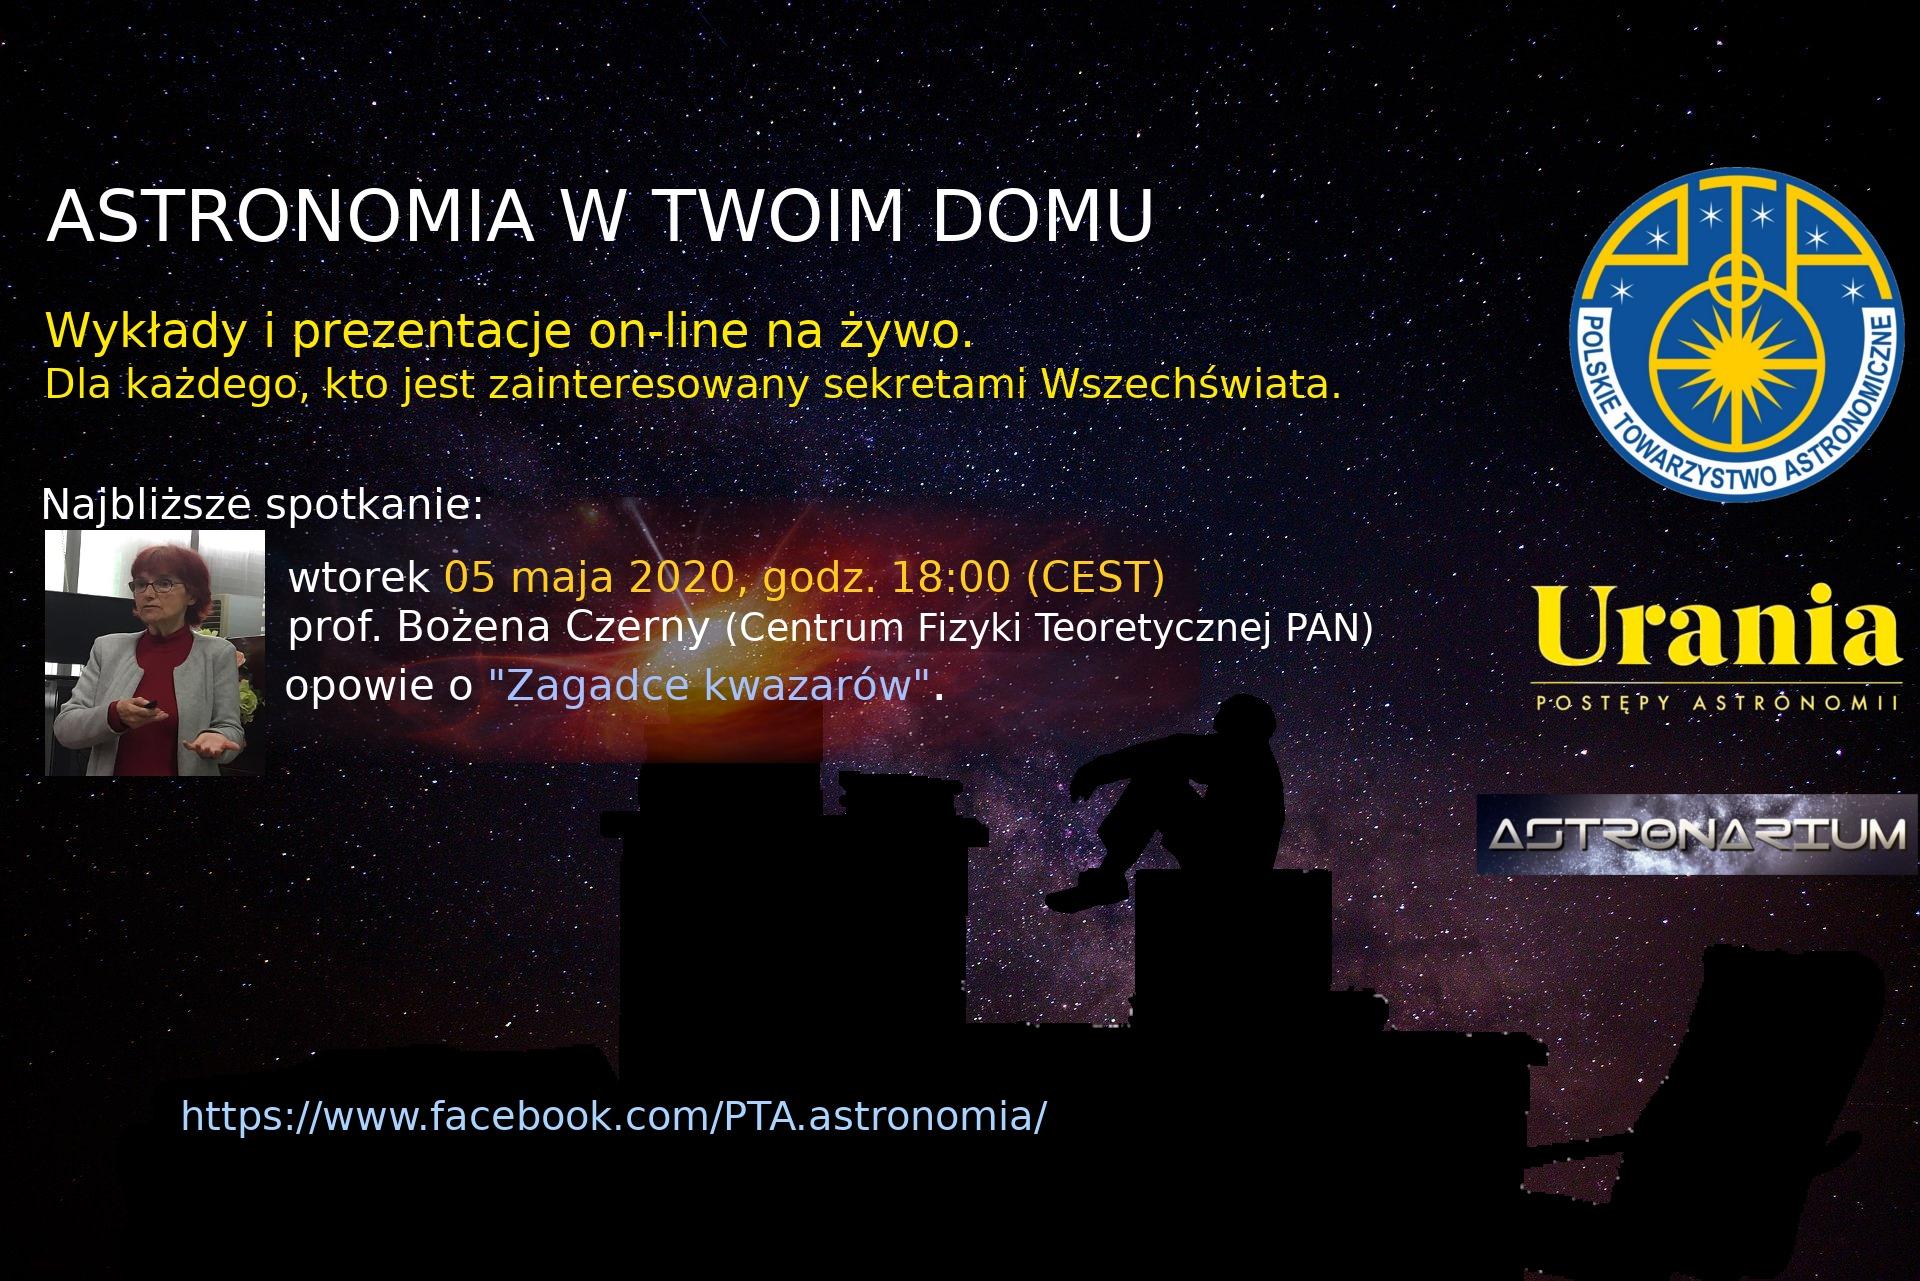 Astronomia wTwoim domu IX @ Online